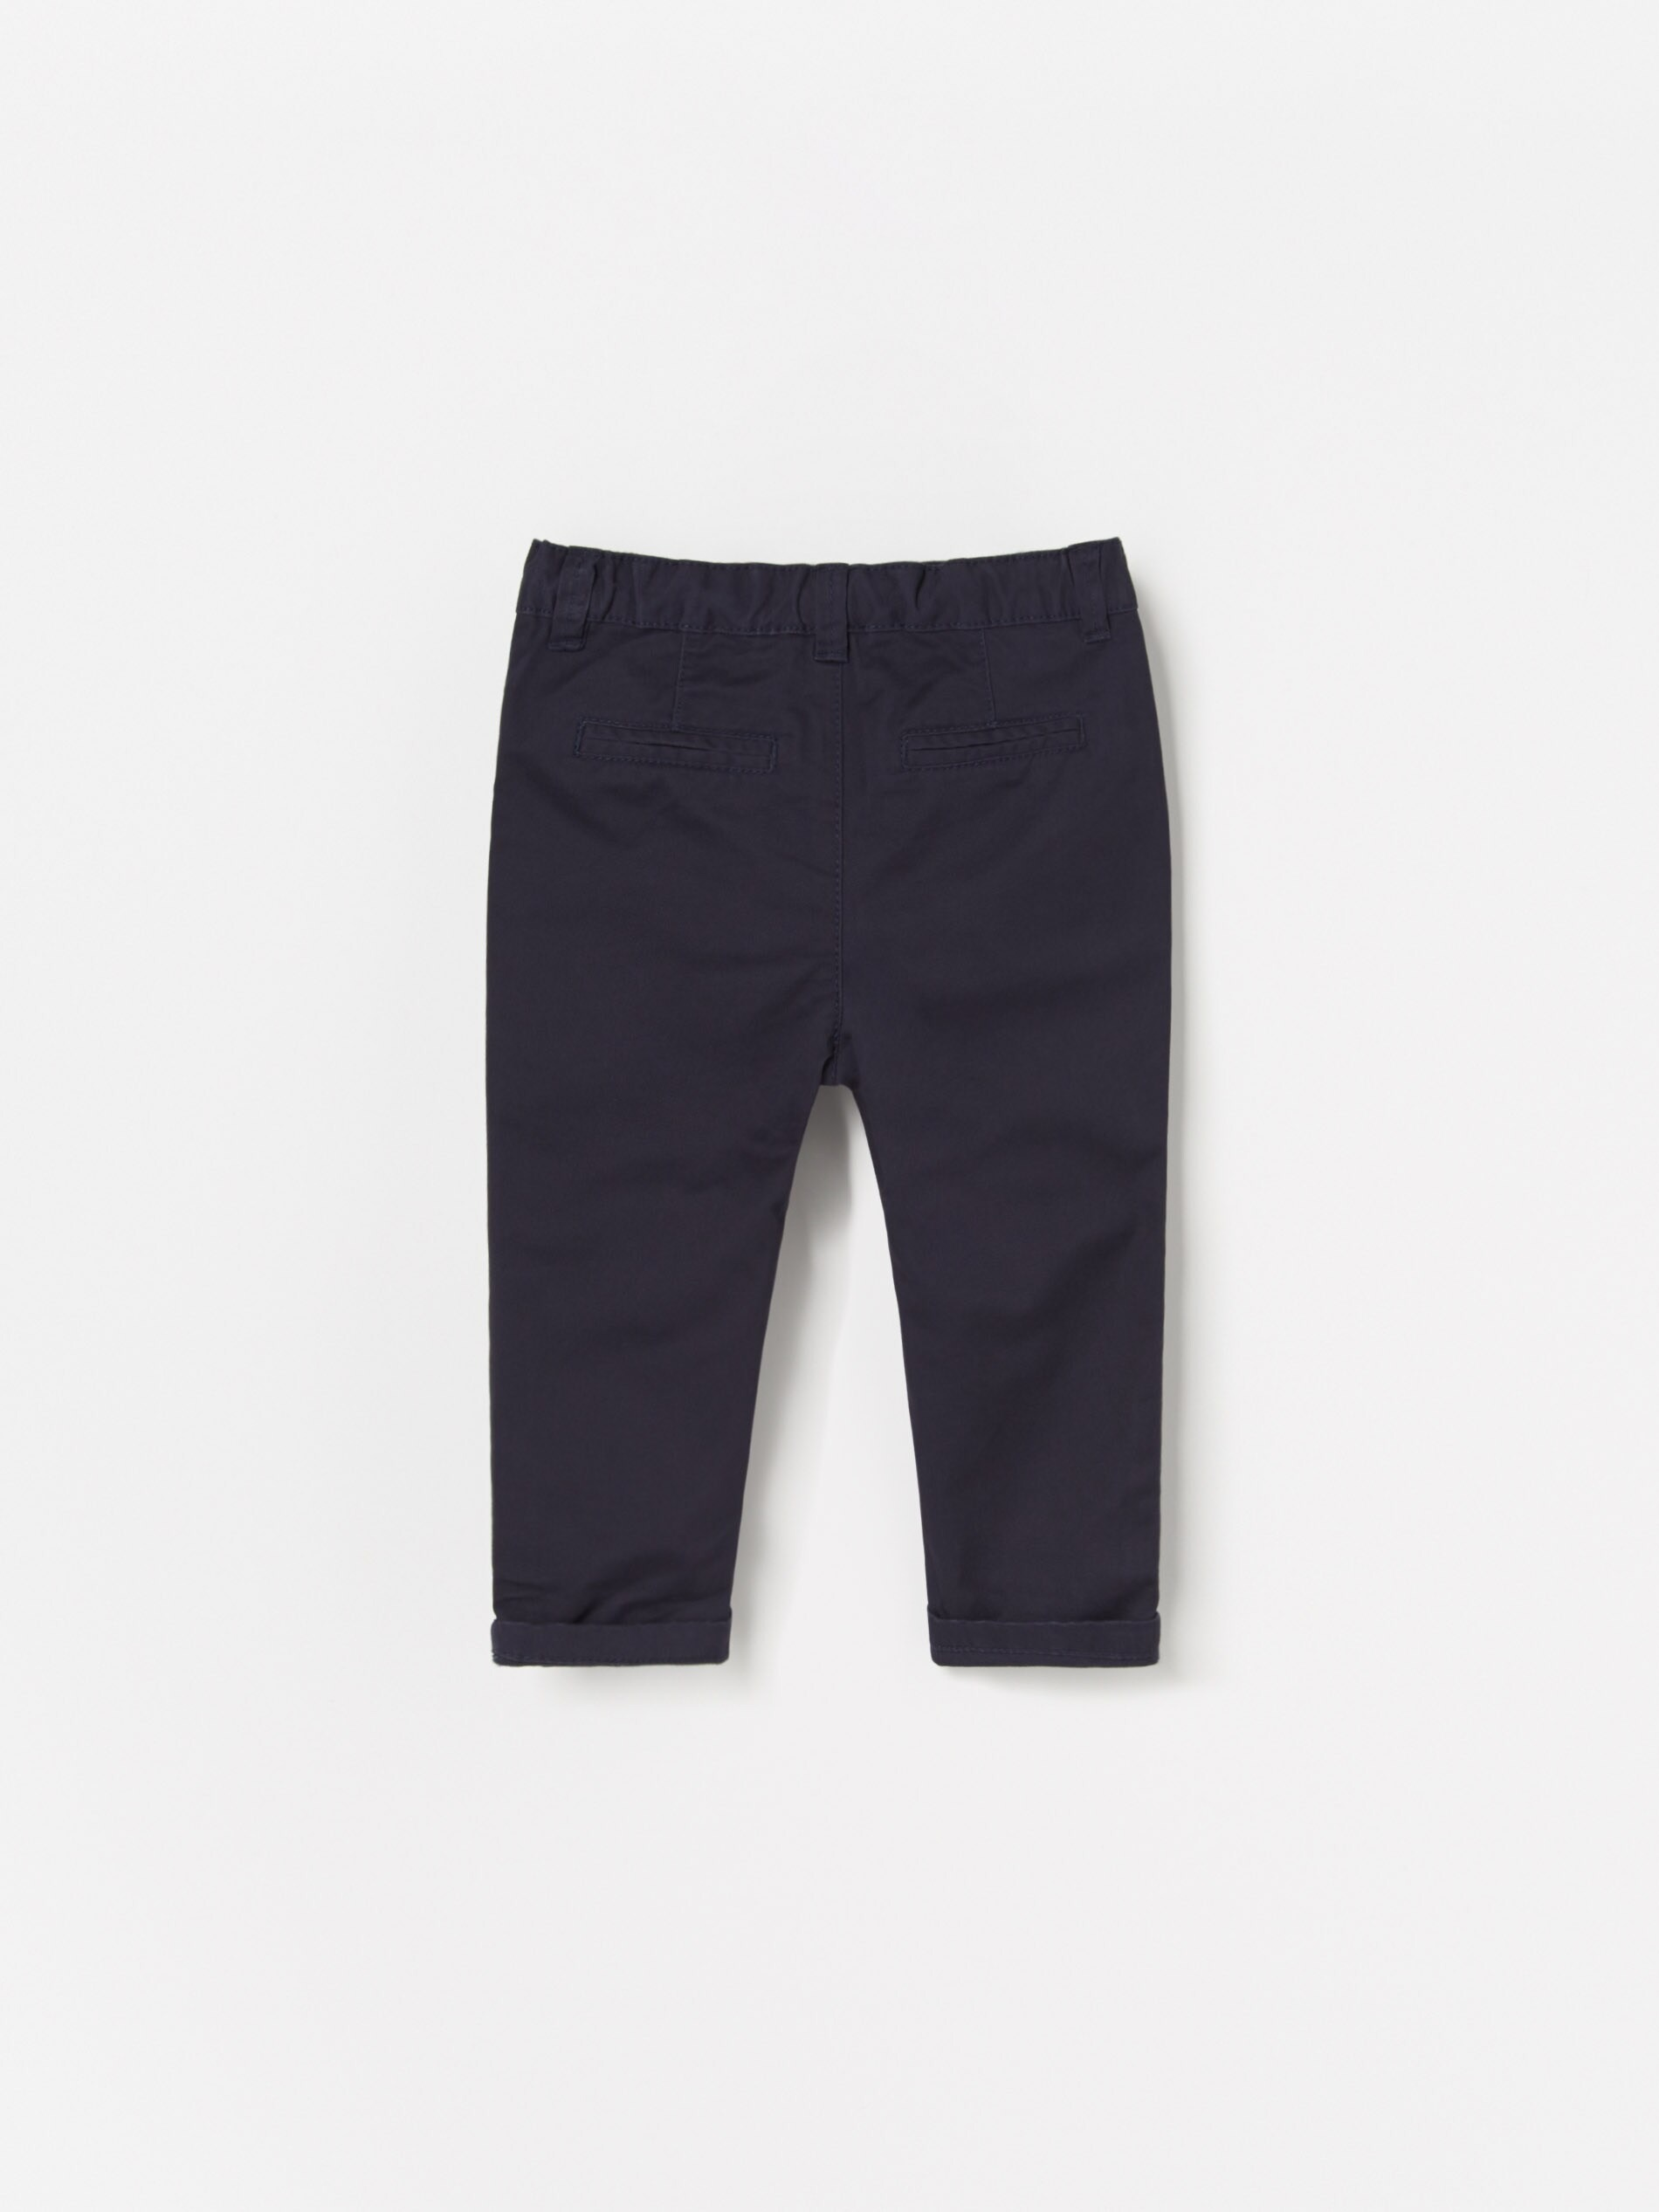 Pantaloni RESERVED Casual (4014) photo 0